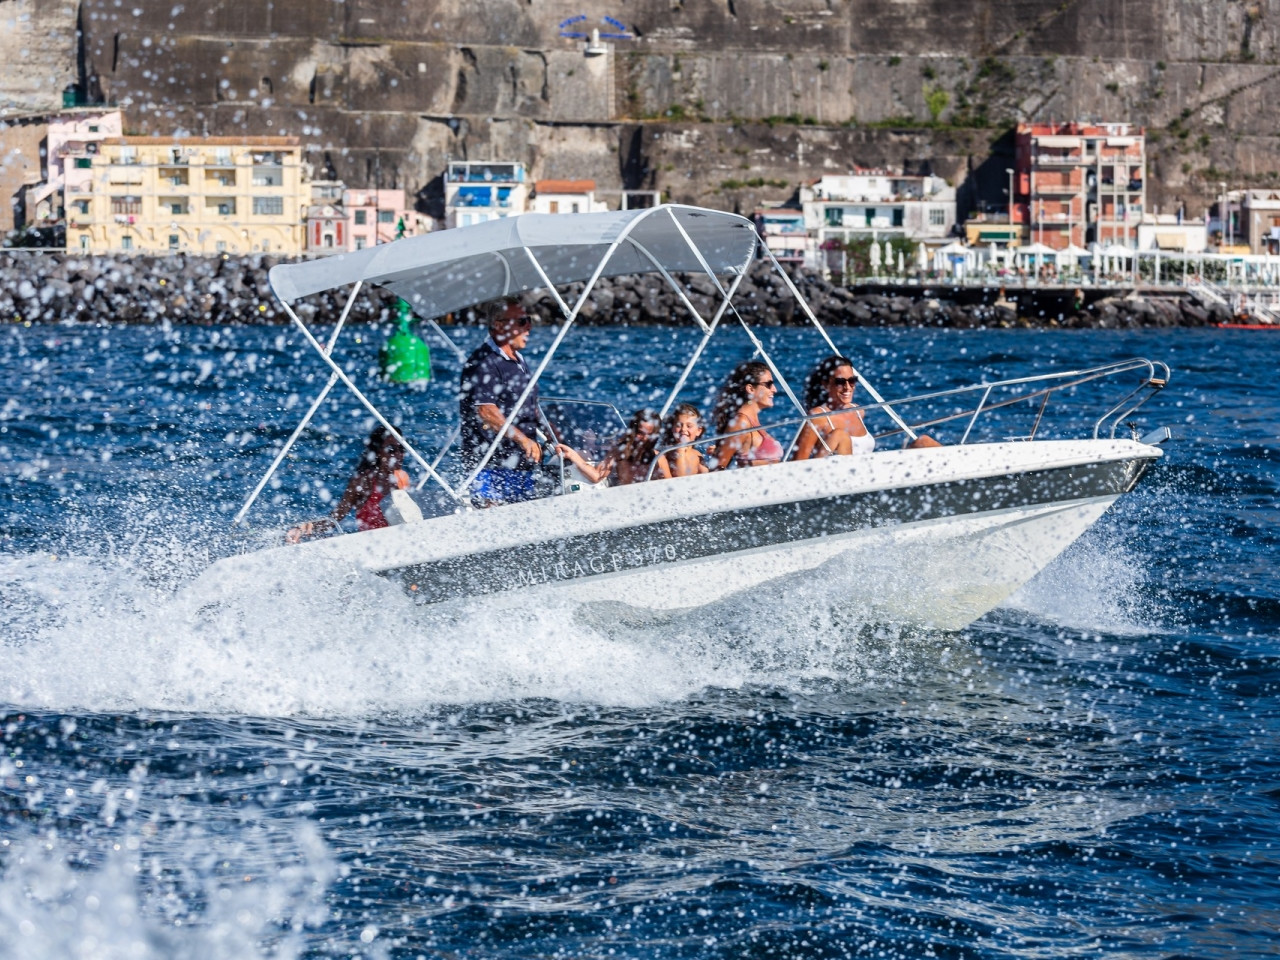 SELF DRIVE BOAT   Mar Amar boat tour